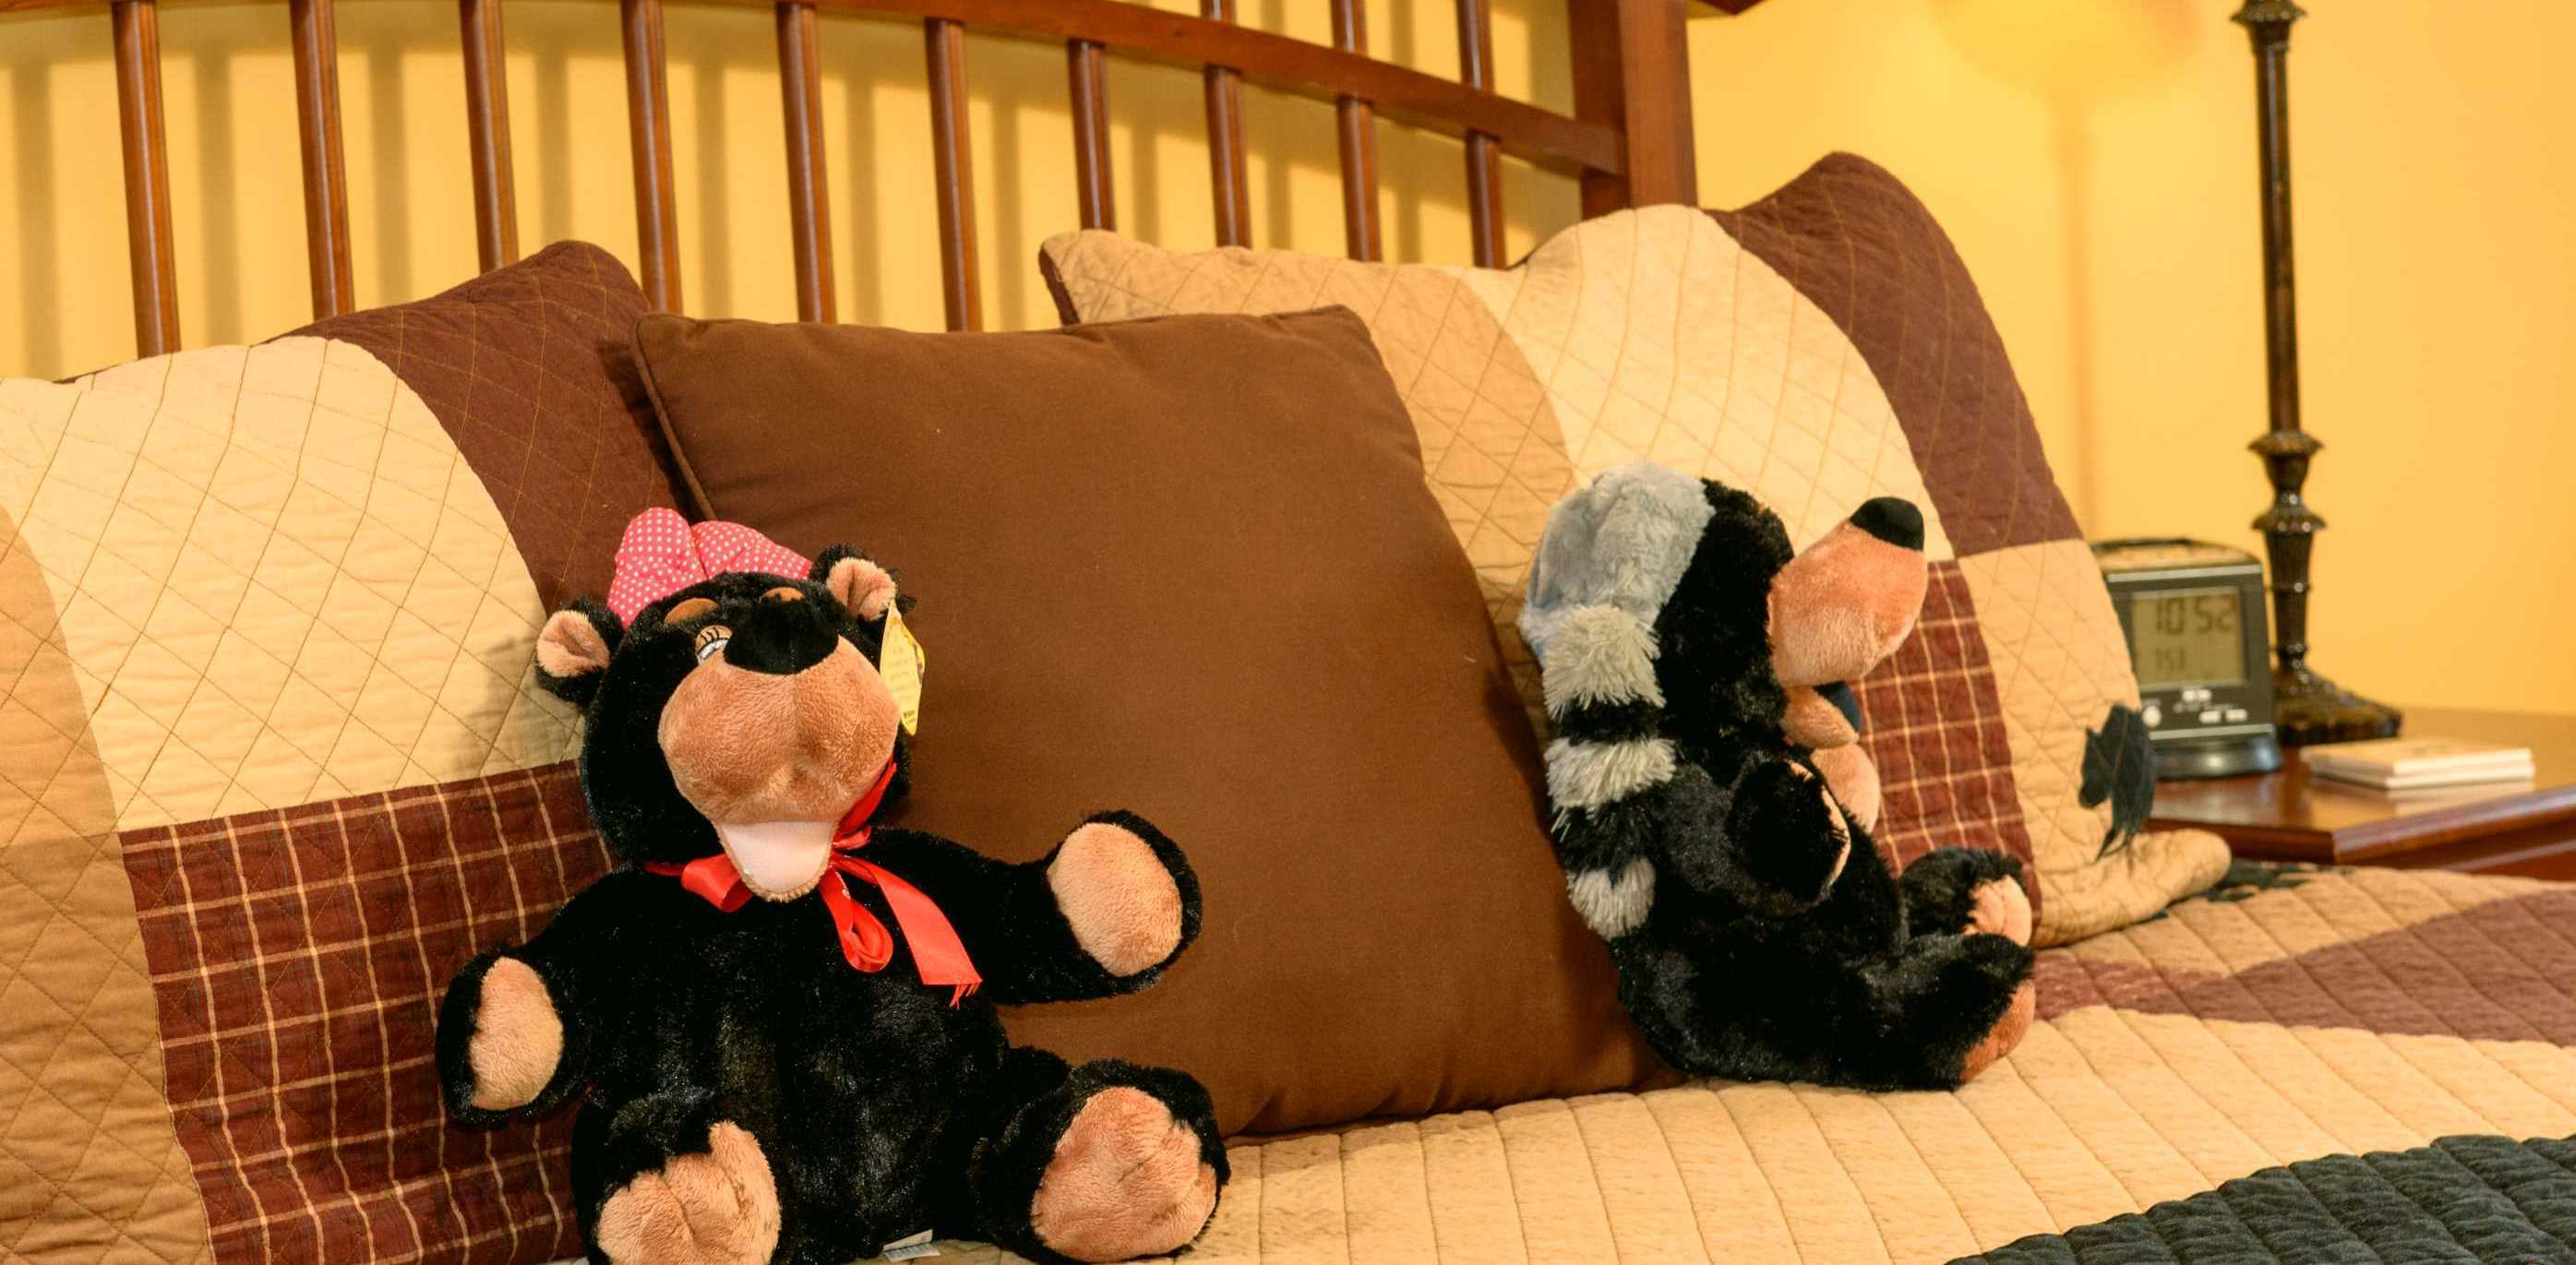 Two black bears on hideaway's bed